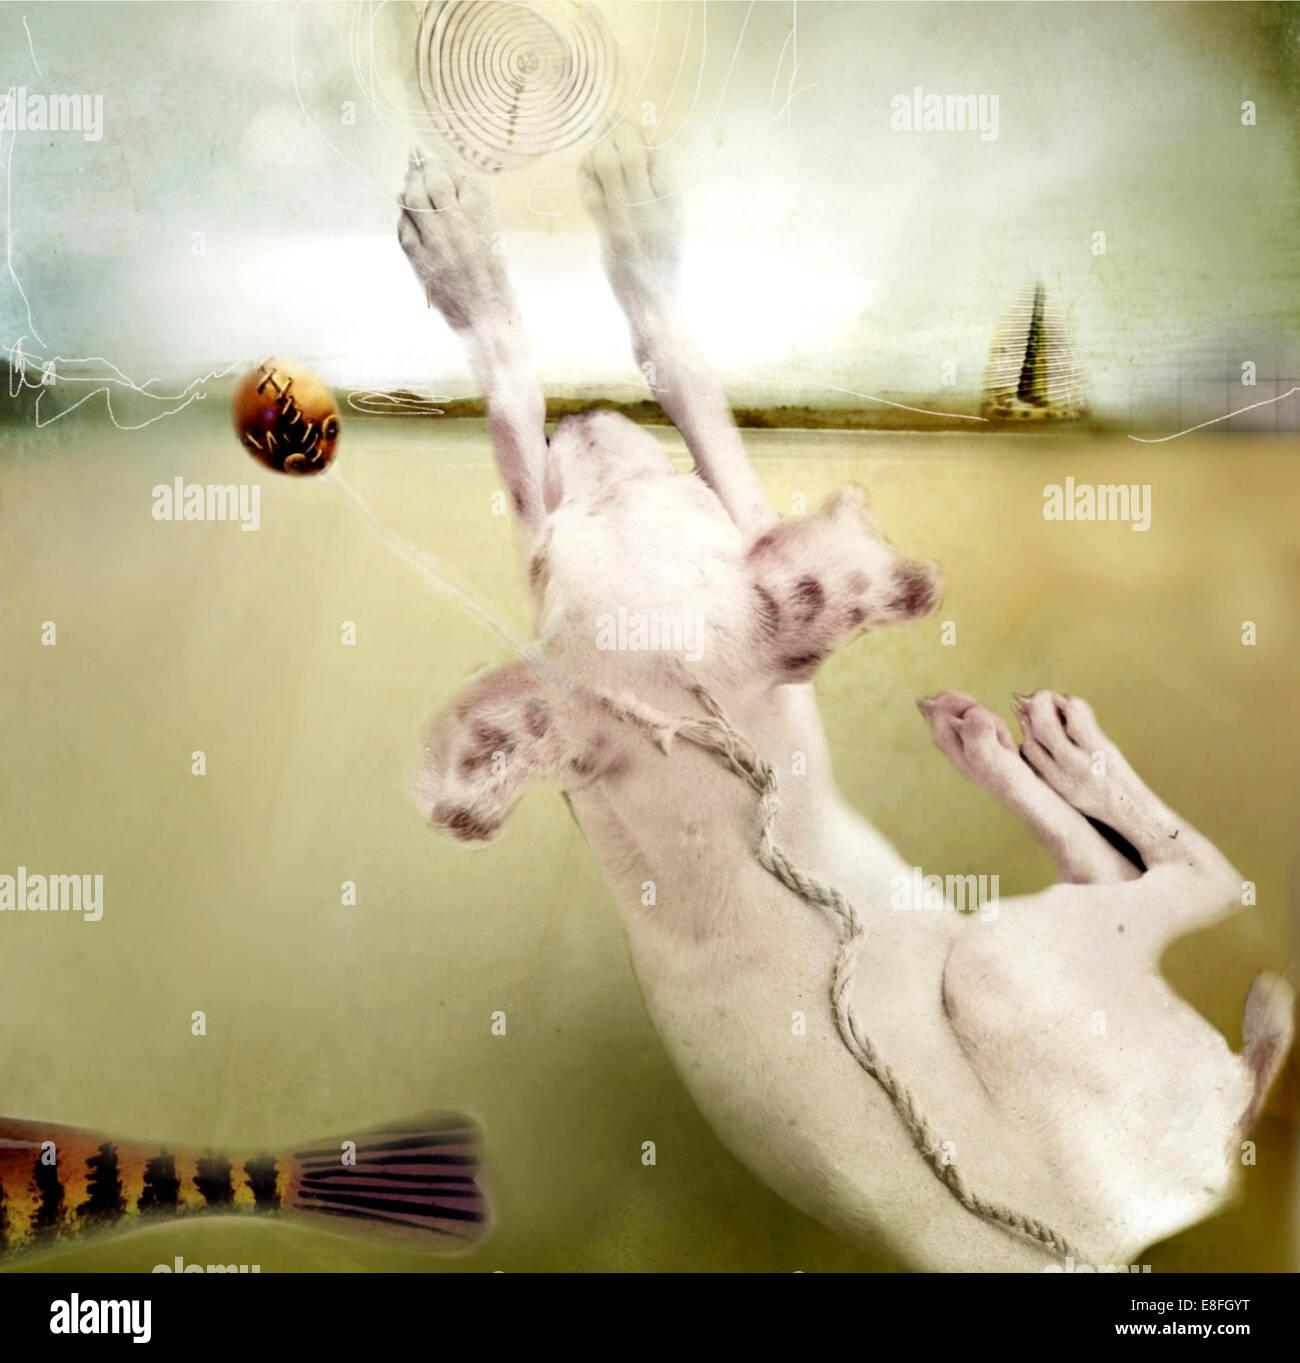 Conceptual dog - Stock Image